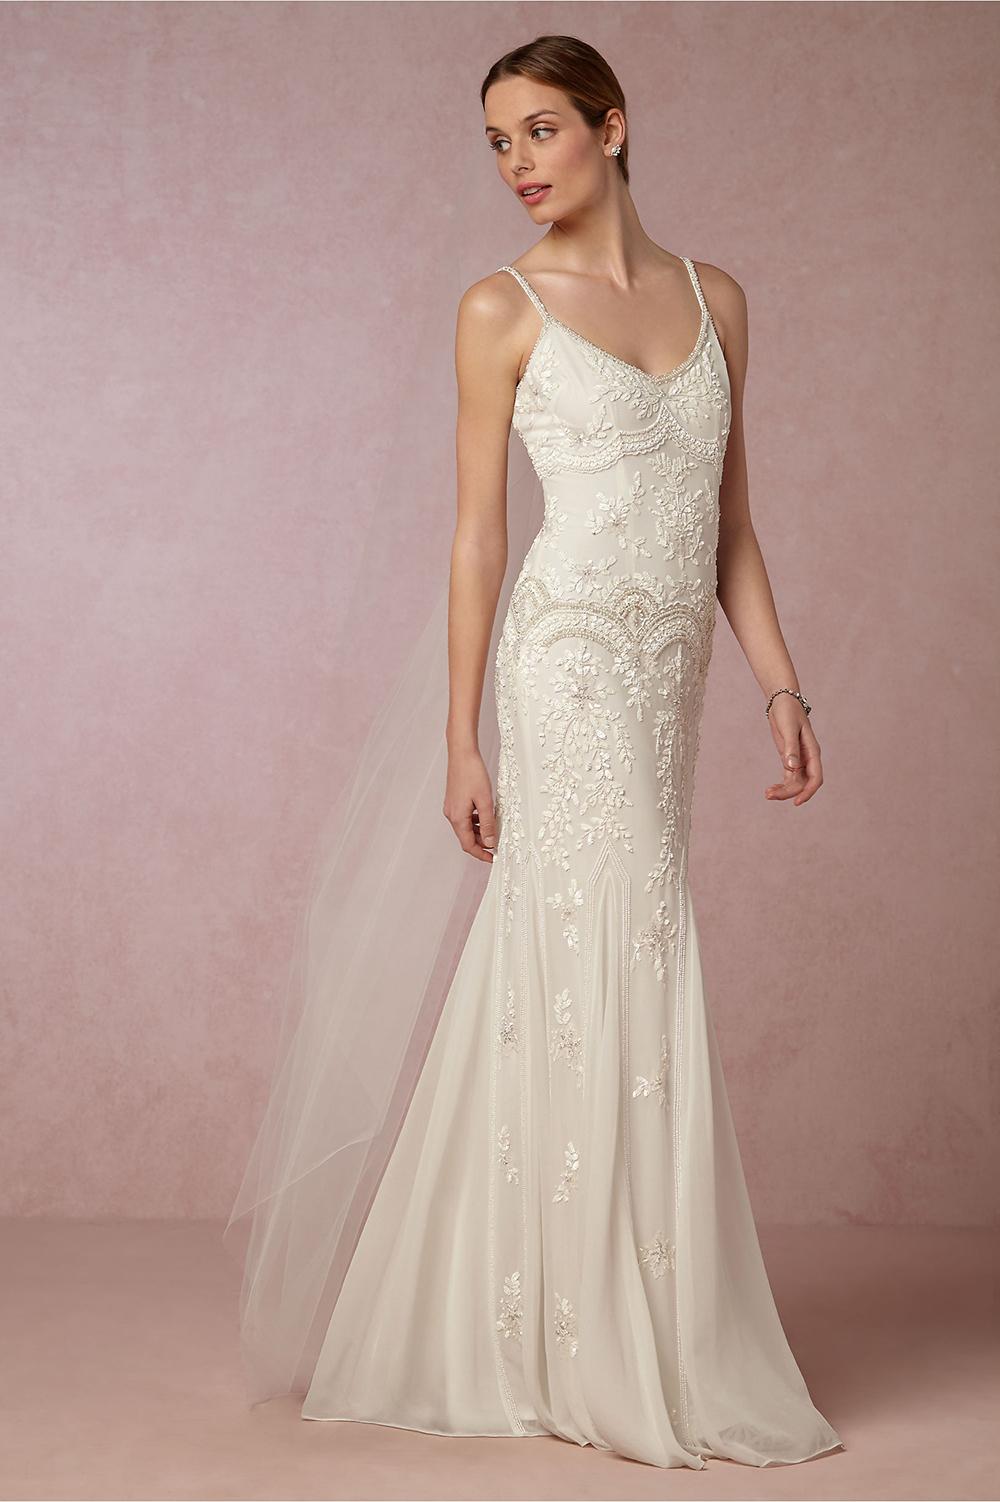 BHLDN Naomi Gown - BHLDN Wedding Gowns